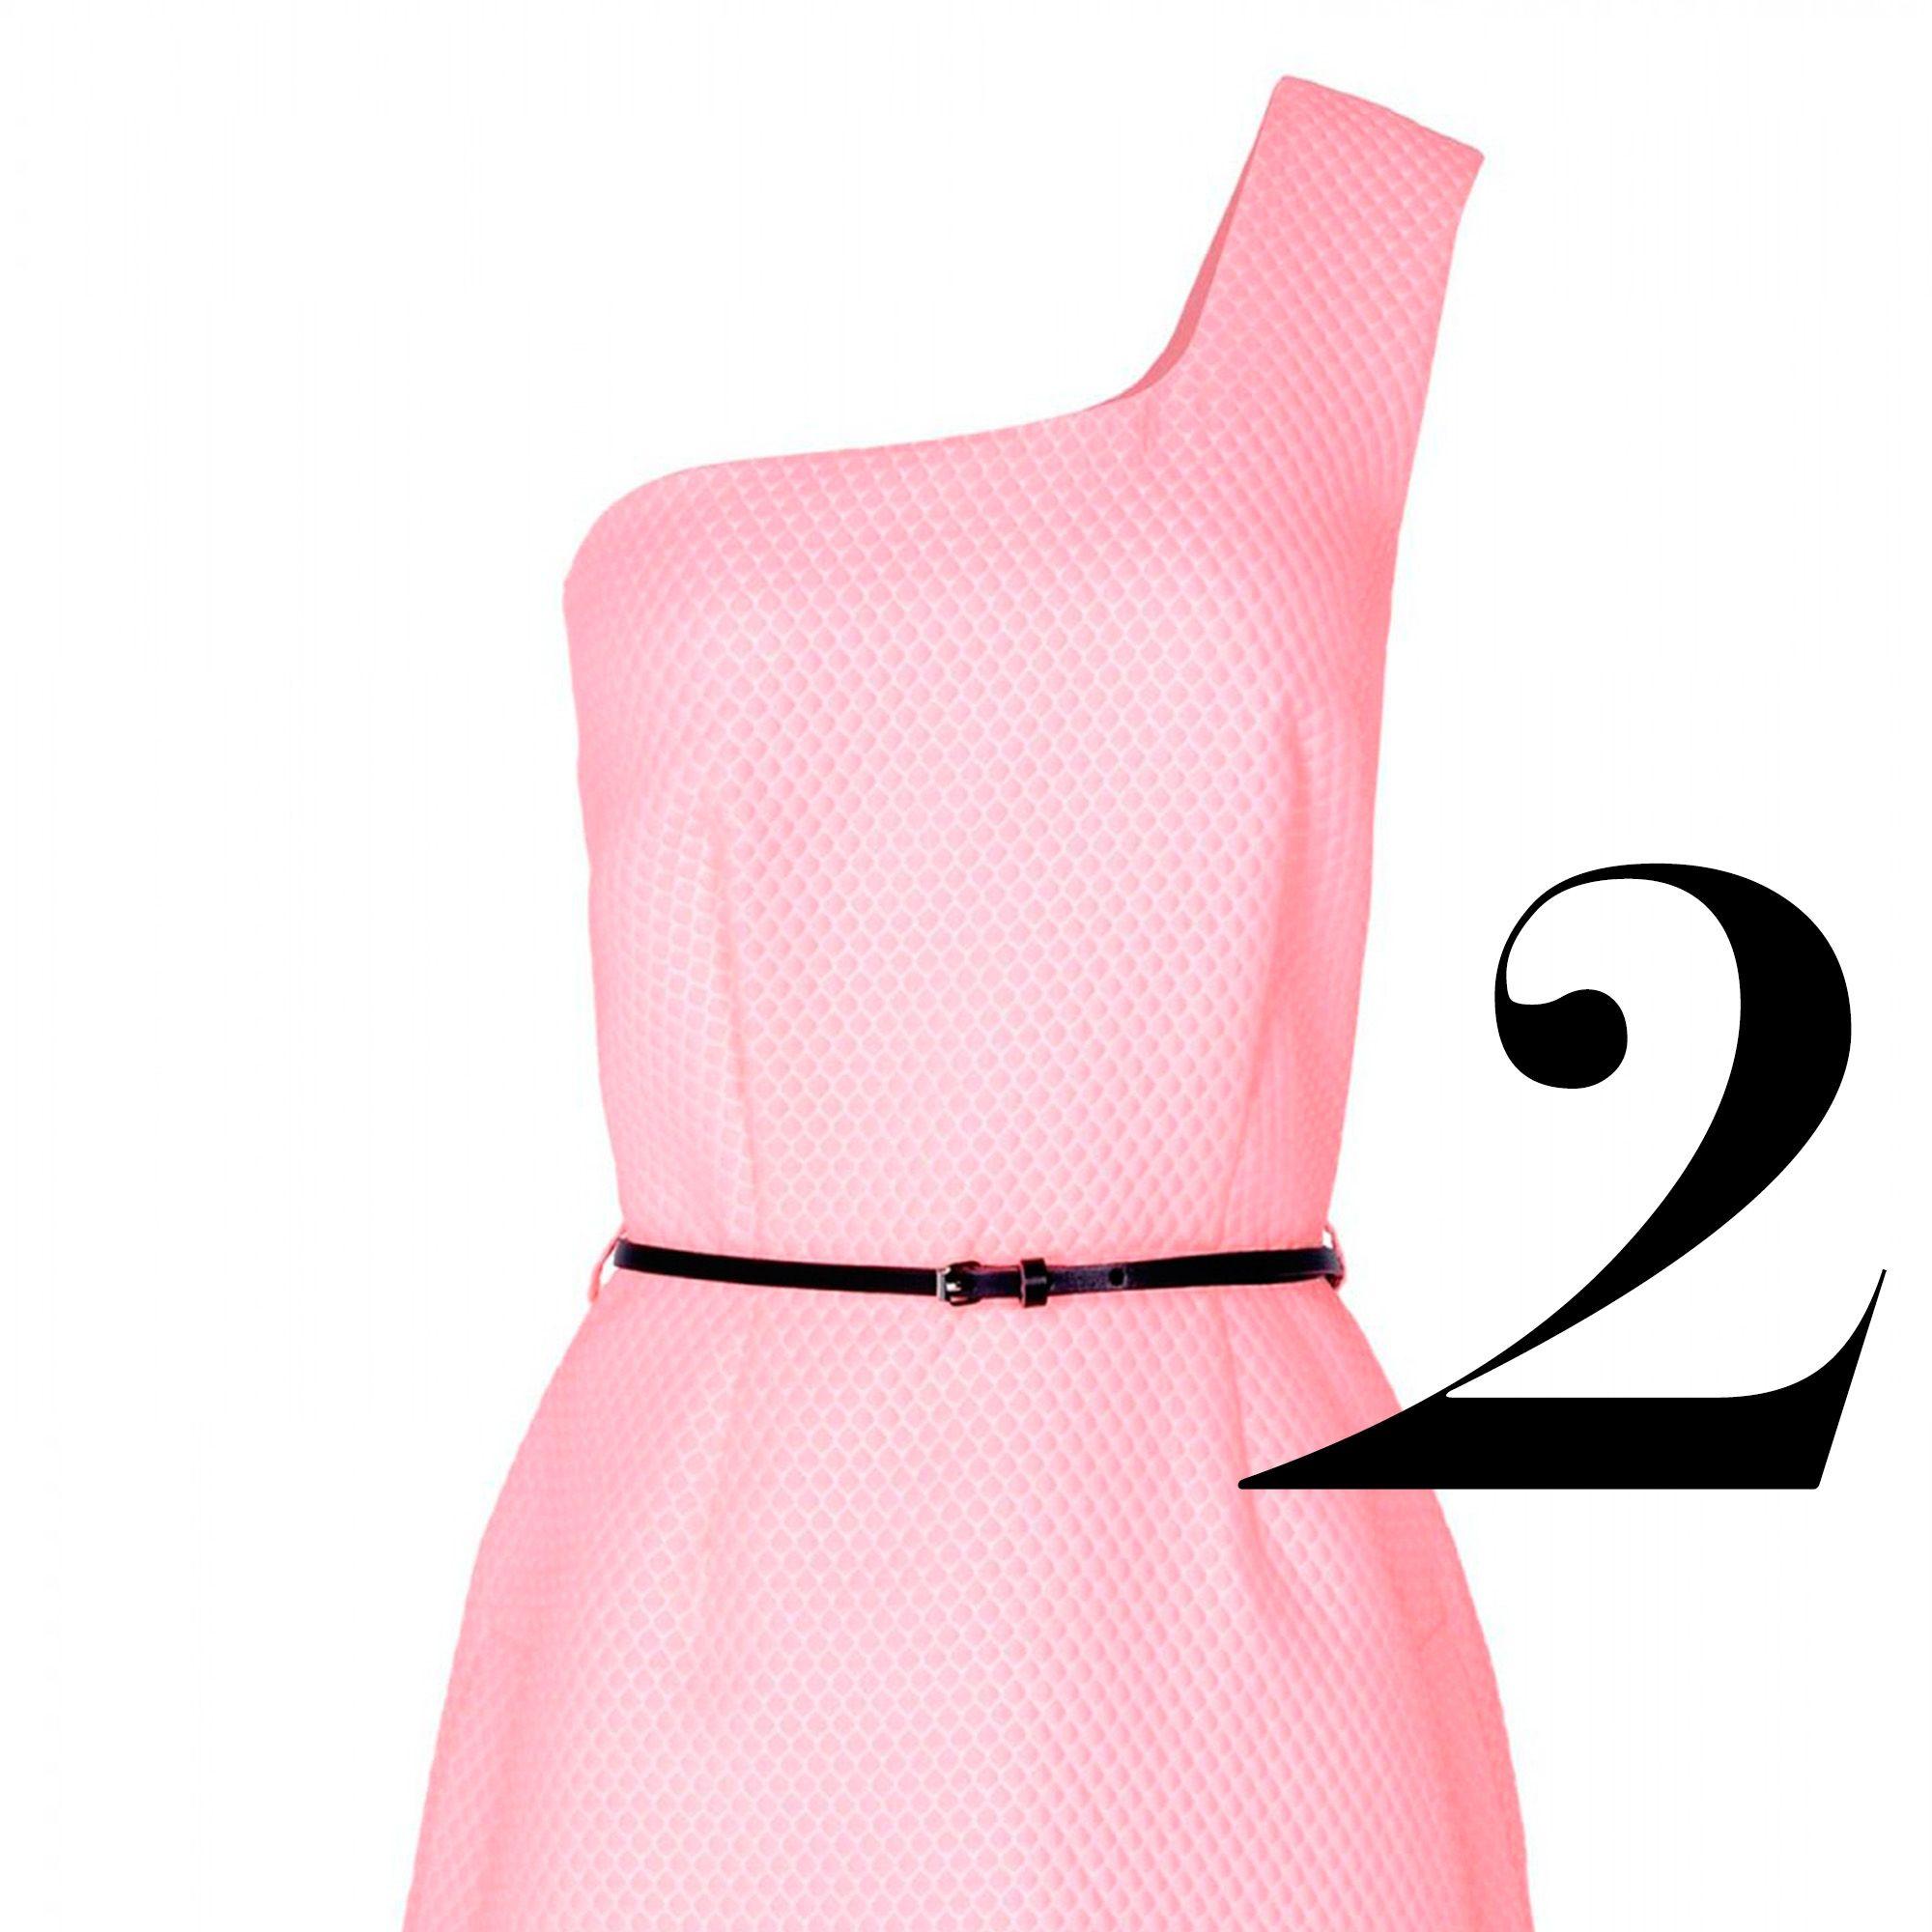 "<p><em>Victoria, Victoria Beckham dress, $860, <a href=""http://shop.harpersbazaar.com/clothing/dresses/pink-jacquard-one-shoulder-dress/"" target=""_blank"">shopBAZAAR.com</a>. </em></p>"